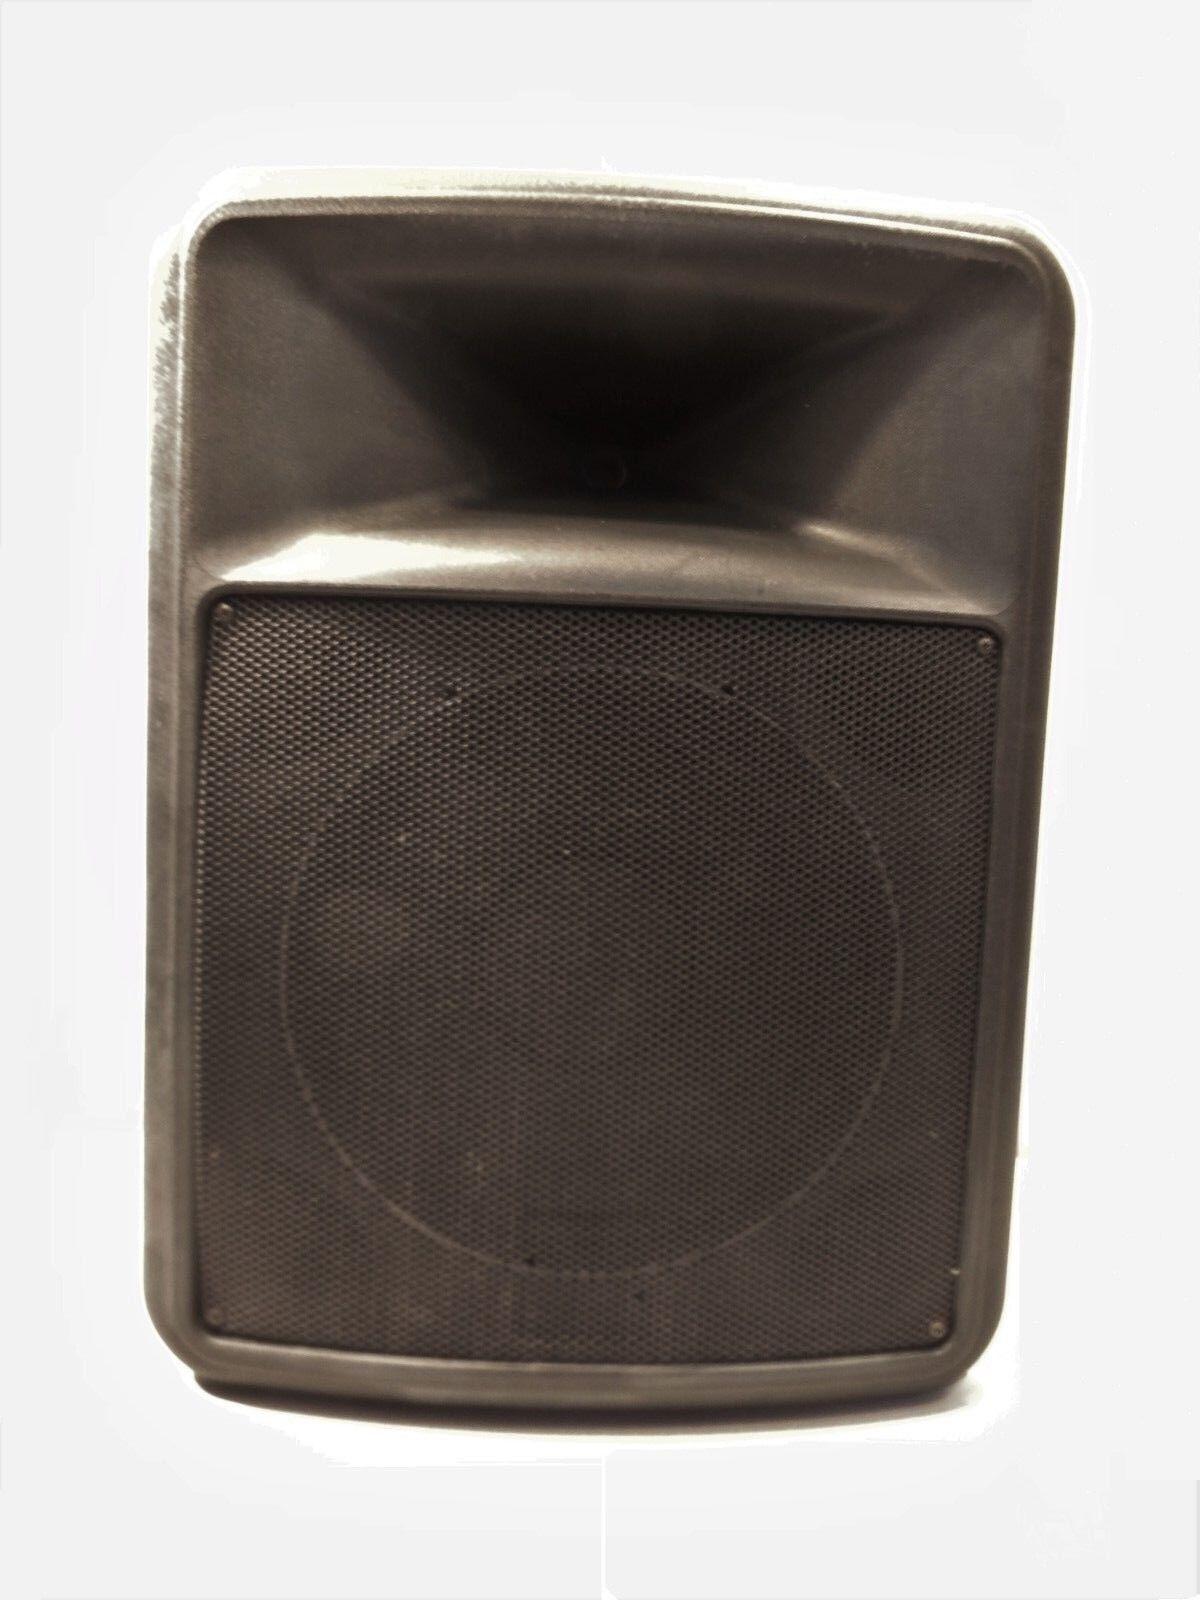 Peavey Impulse 200  Weather Resistant Two Way 12  PA Speaker System 600 Watt